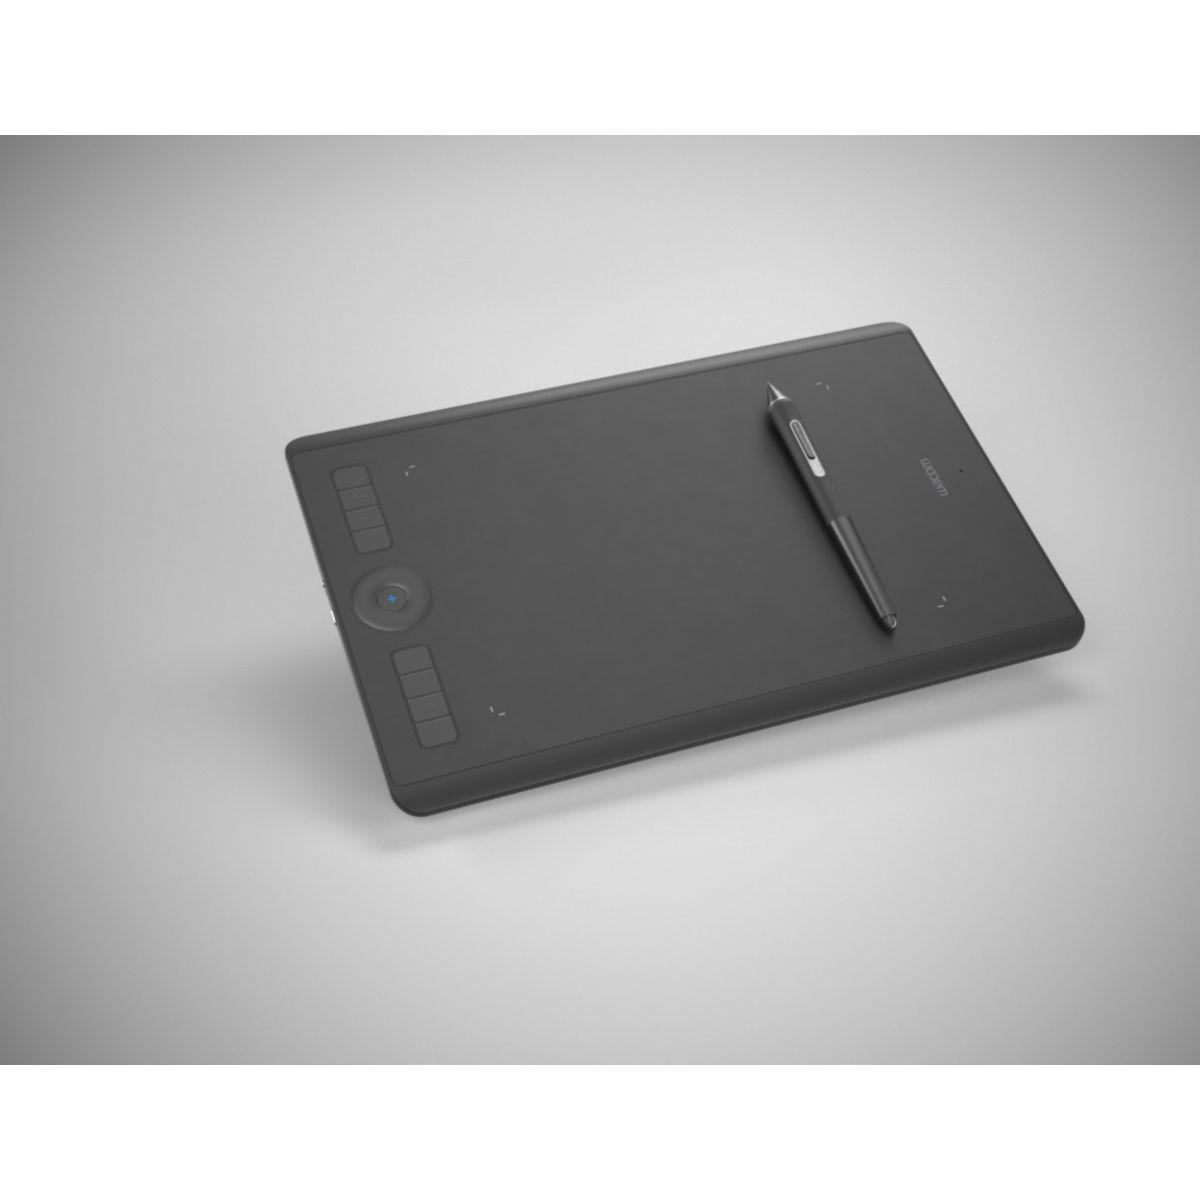 Tablette graph wacom intuos pro pth-660- - livraison offerte : code liv